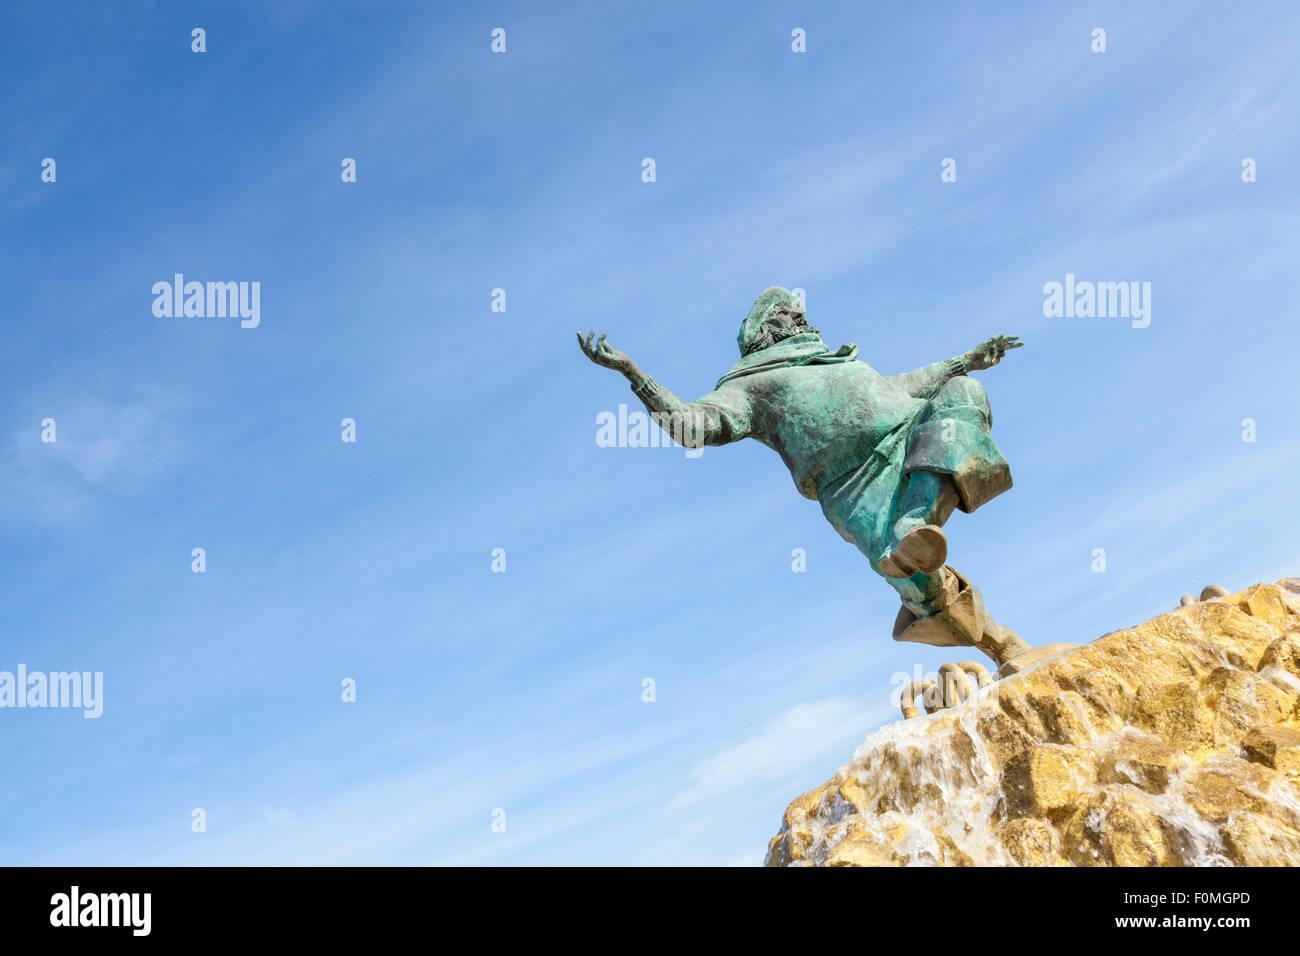 The Jolly Fisherman, Skegness, Lincolnshire, England, UK - Stock Image